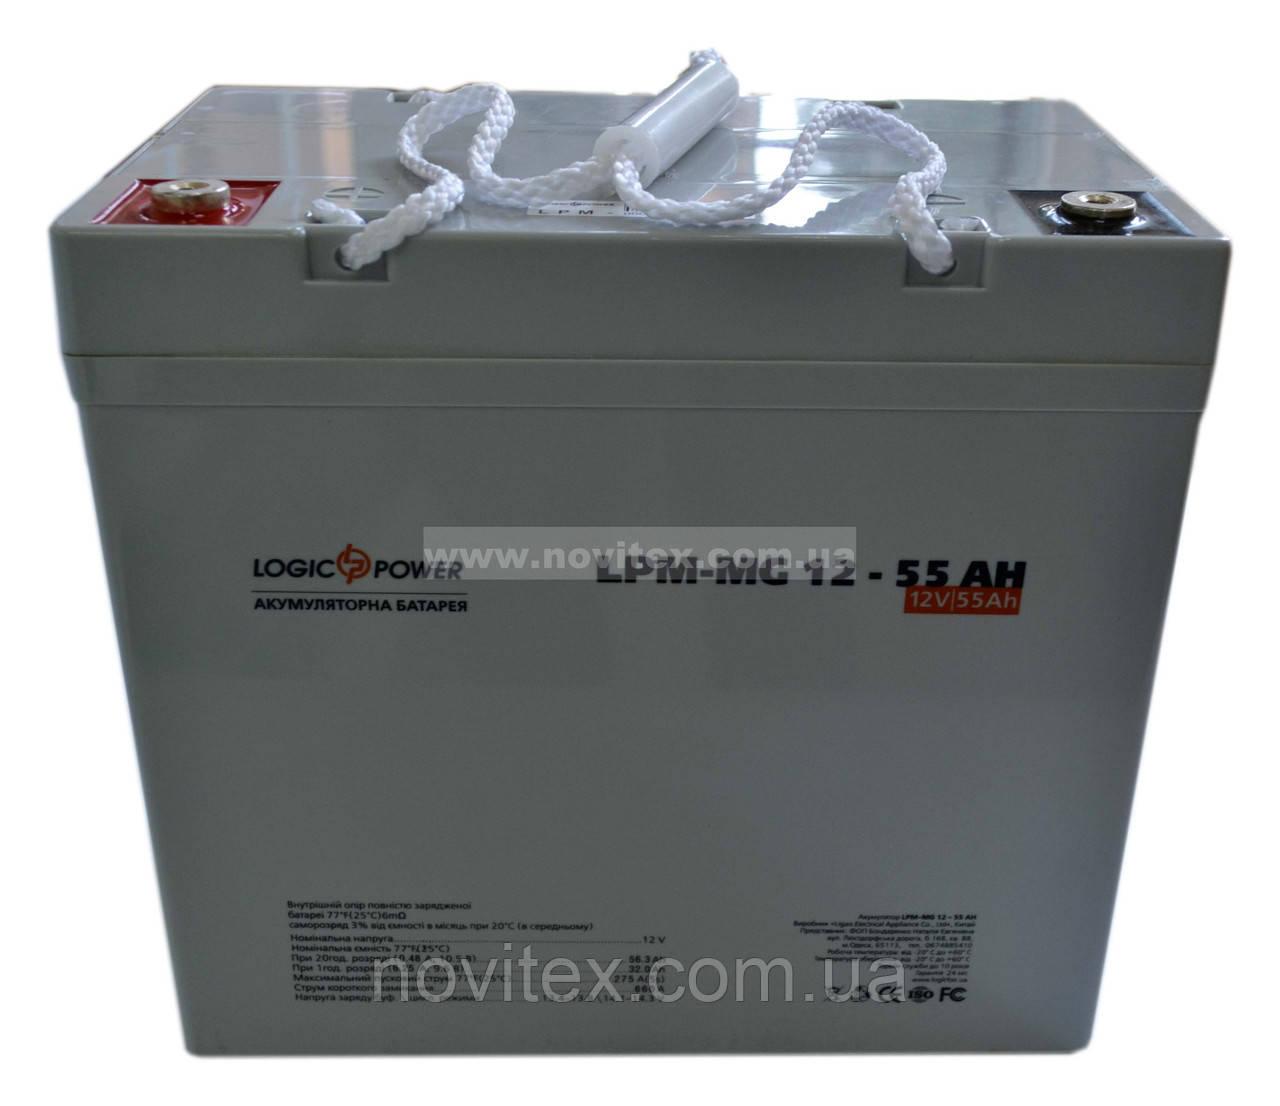 Аккумулятор мультигелевый Logicpower LPM-MG 12V 55AH